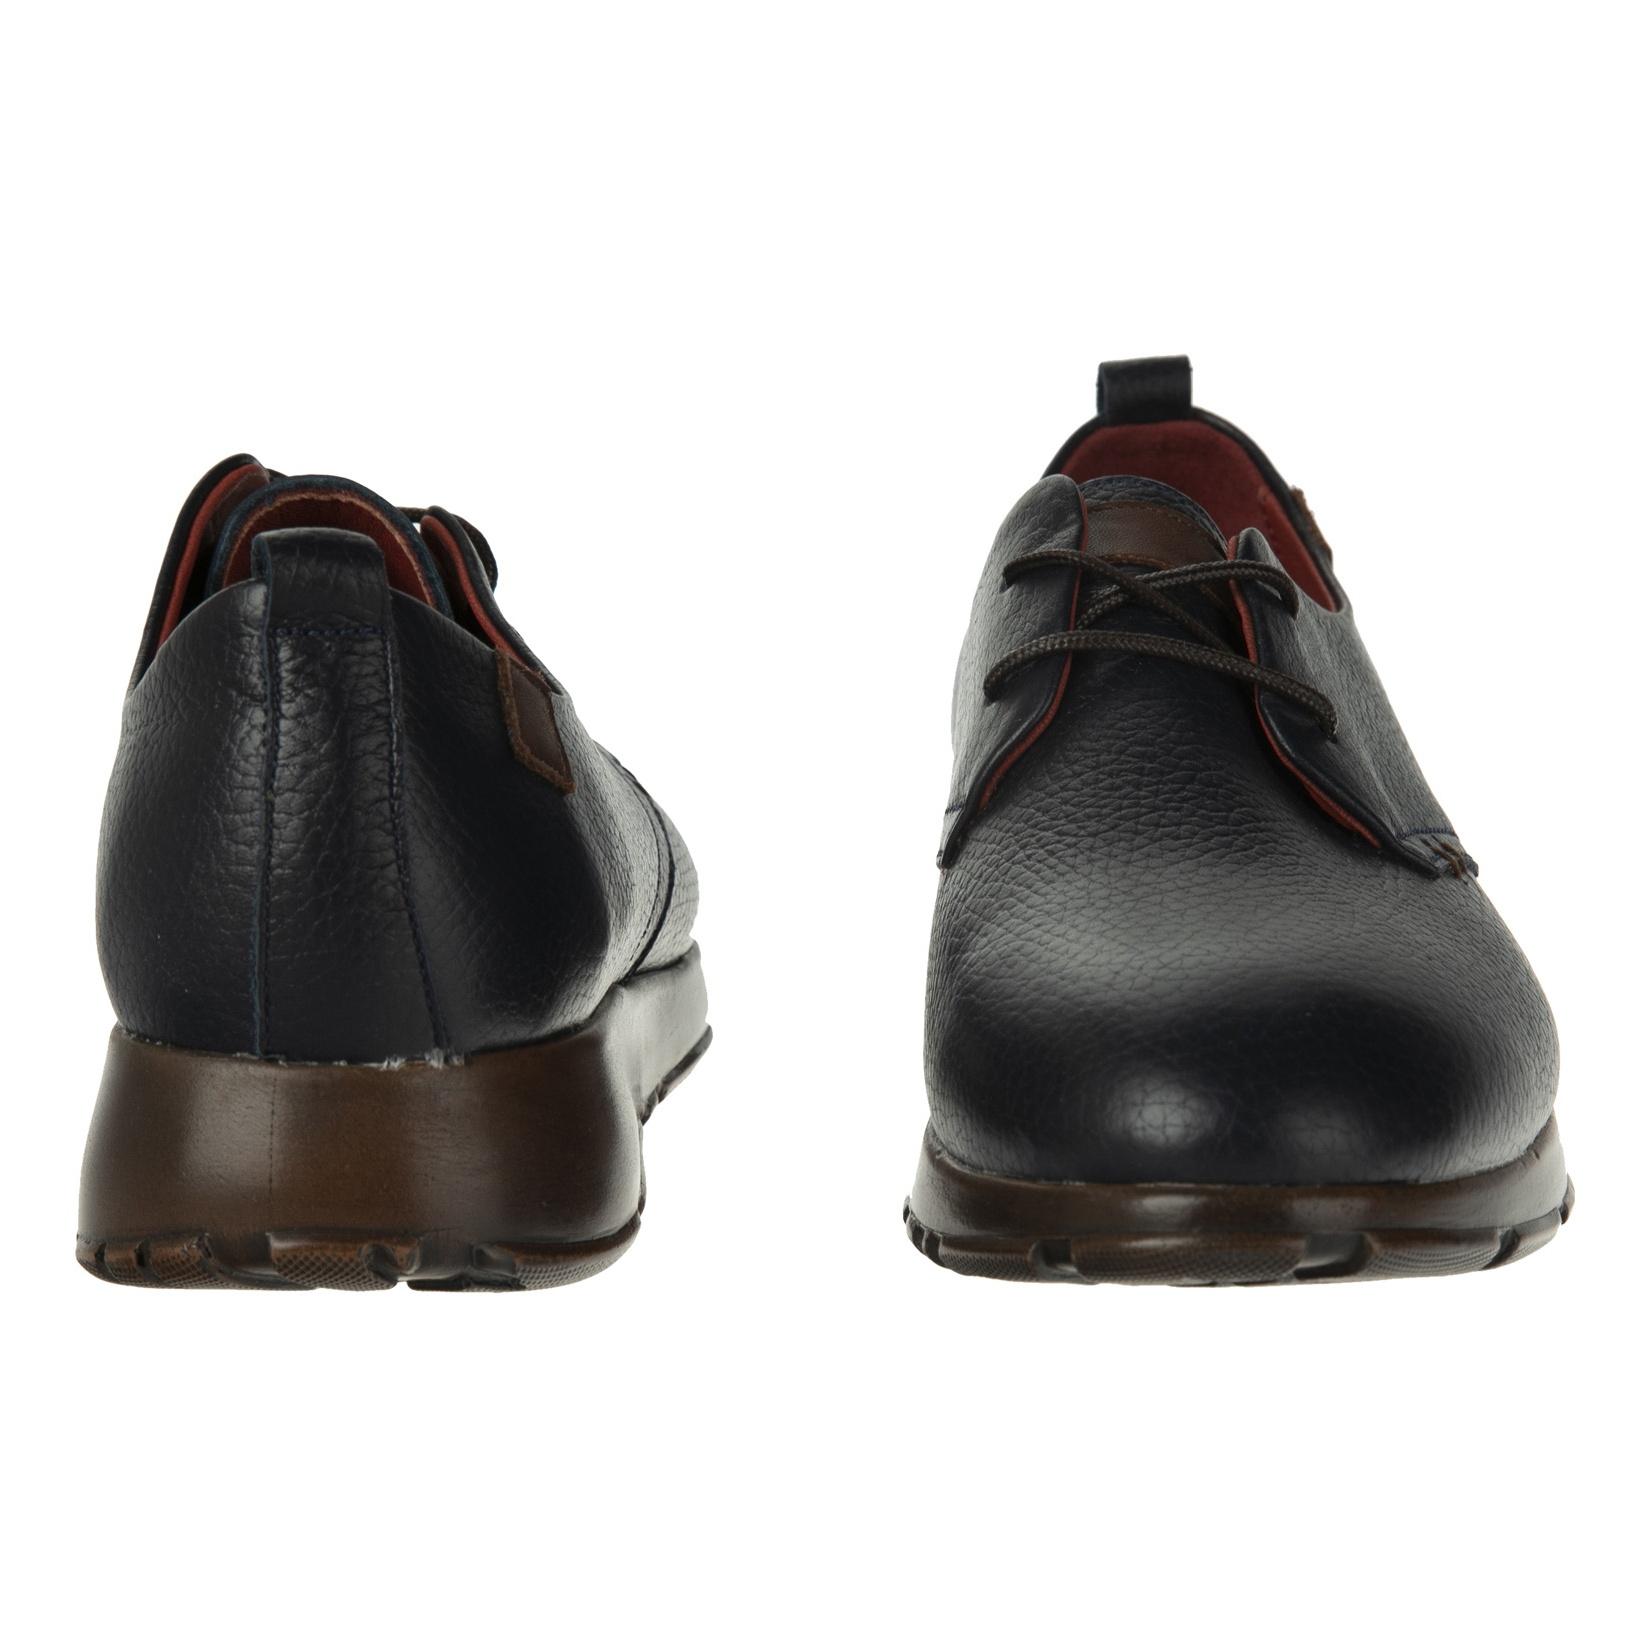 کفش روزمره زنانه ساتین مدل SN5184A-103 -  - 4